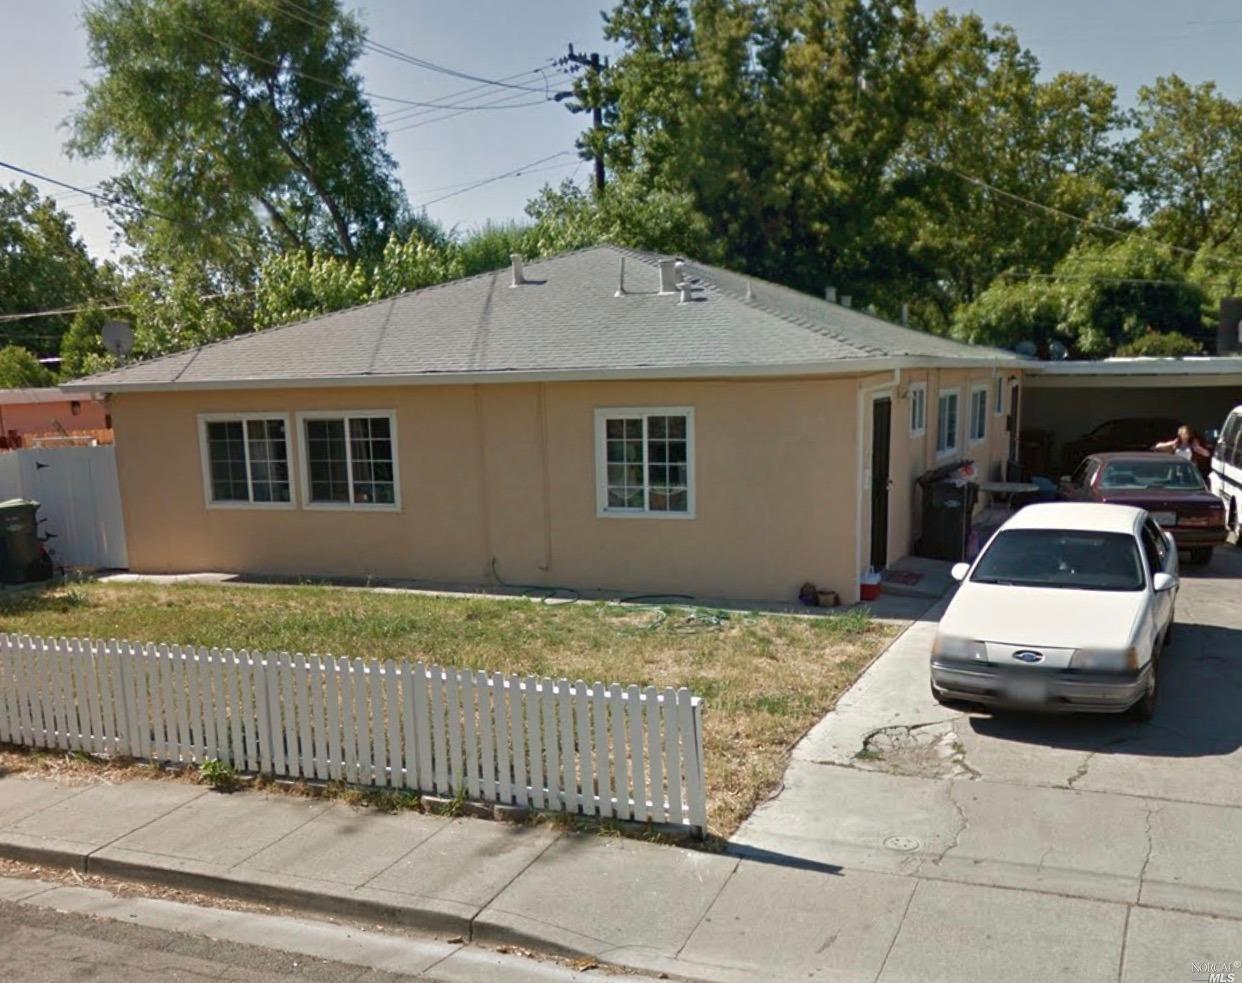 Multi-Family Home for Sale at 709 Oregon Street 709 Oregon Street Fairfield, California 94533 United States